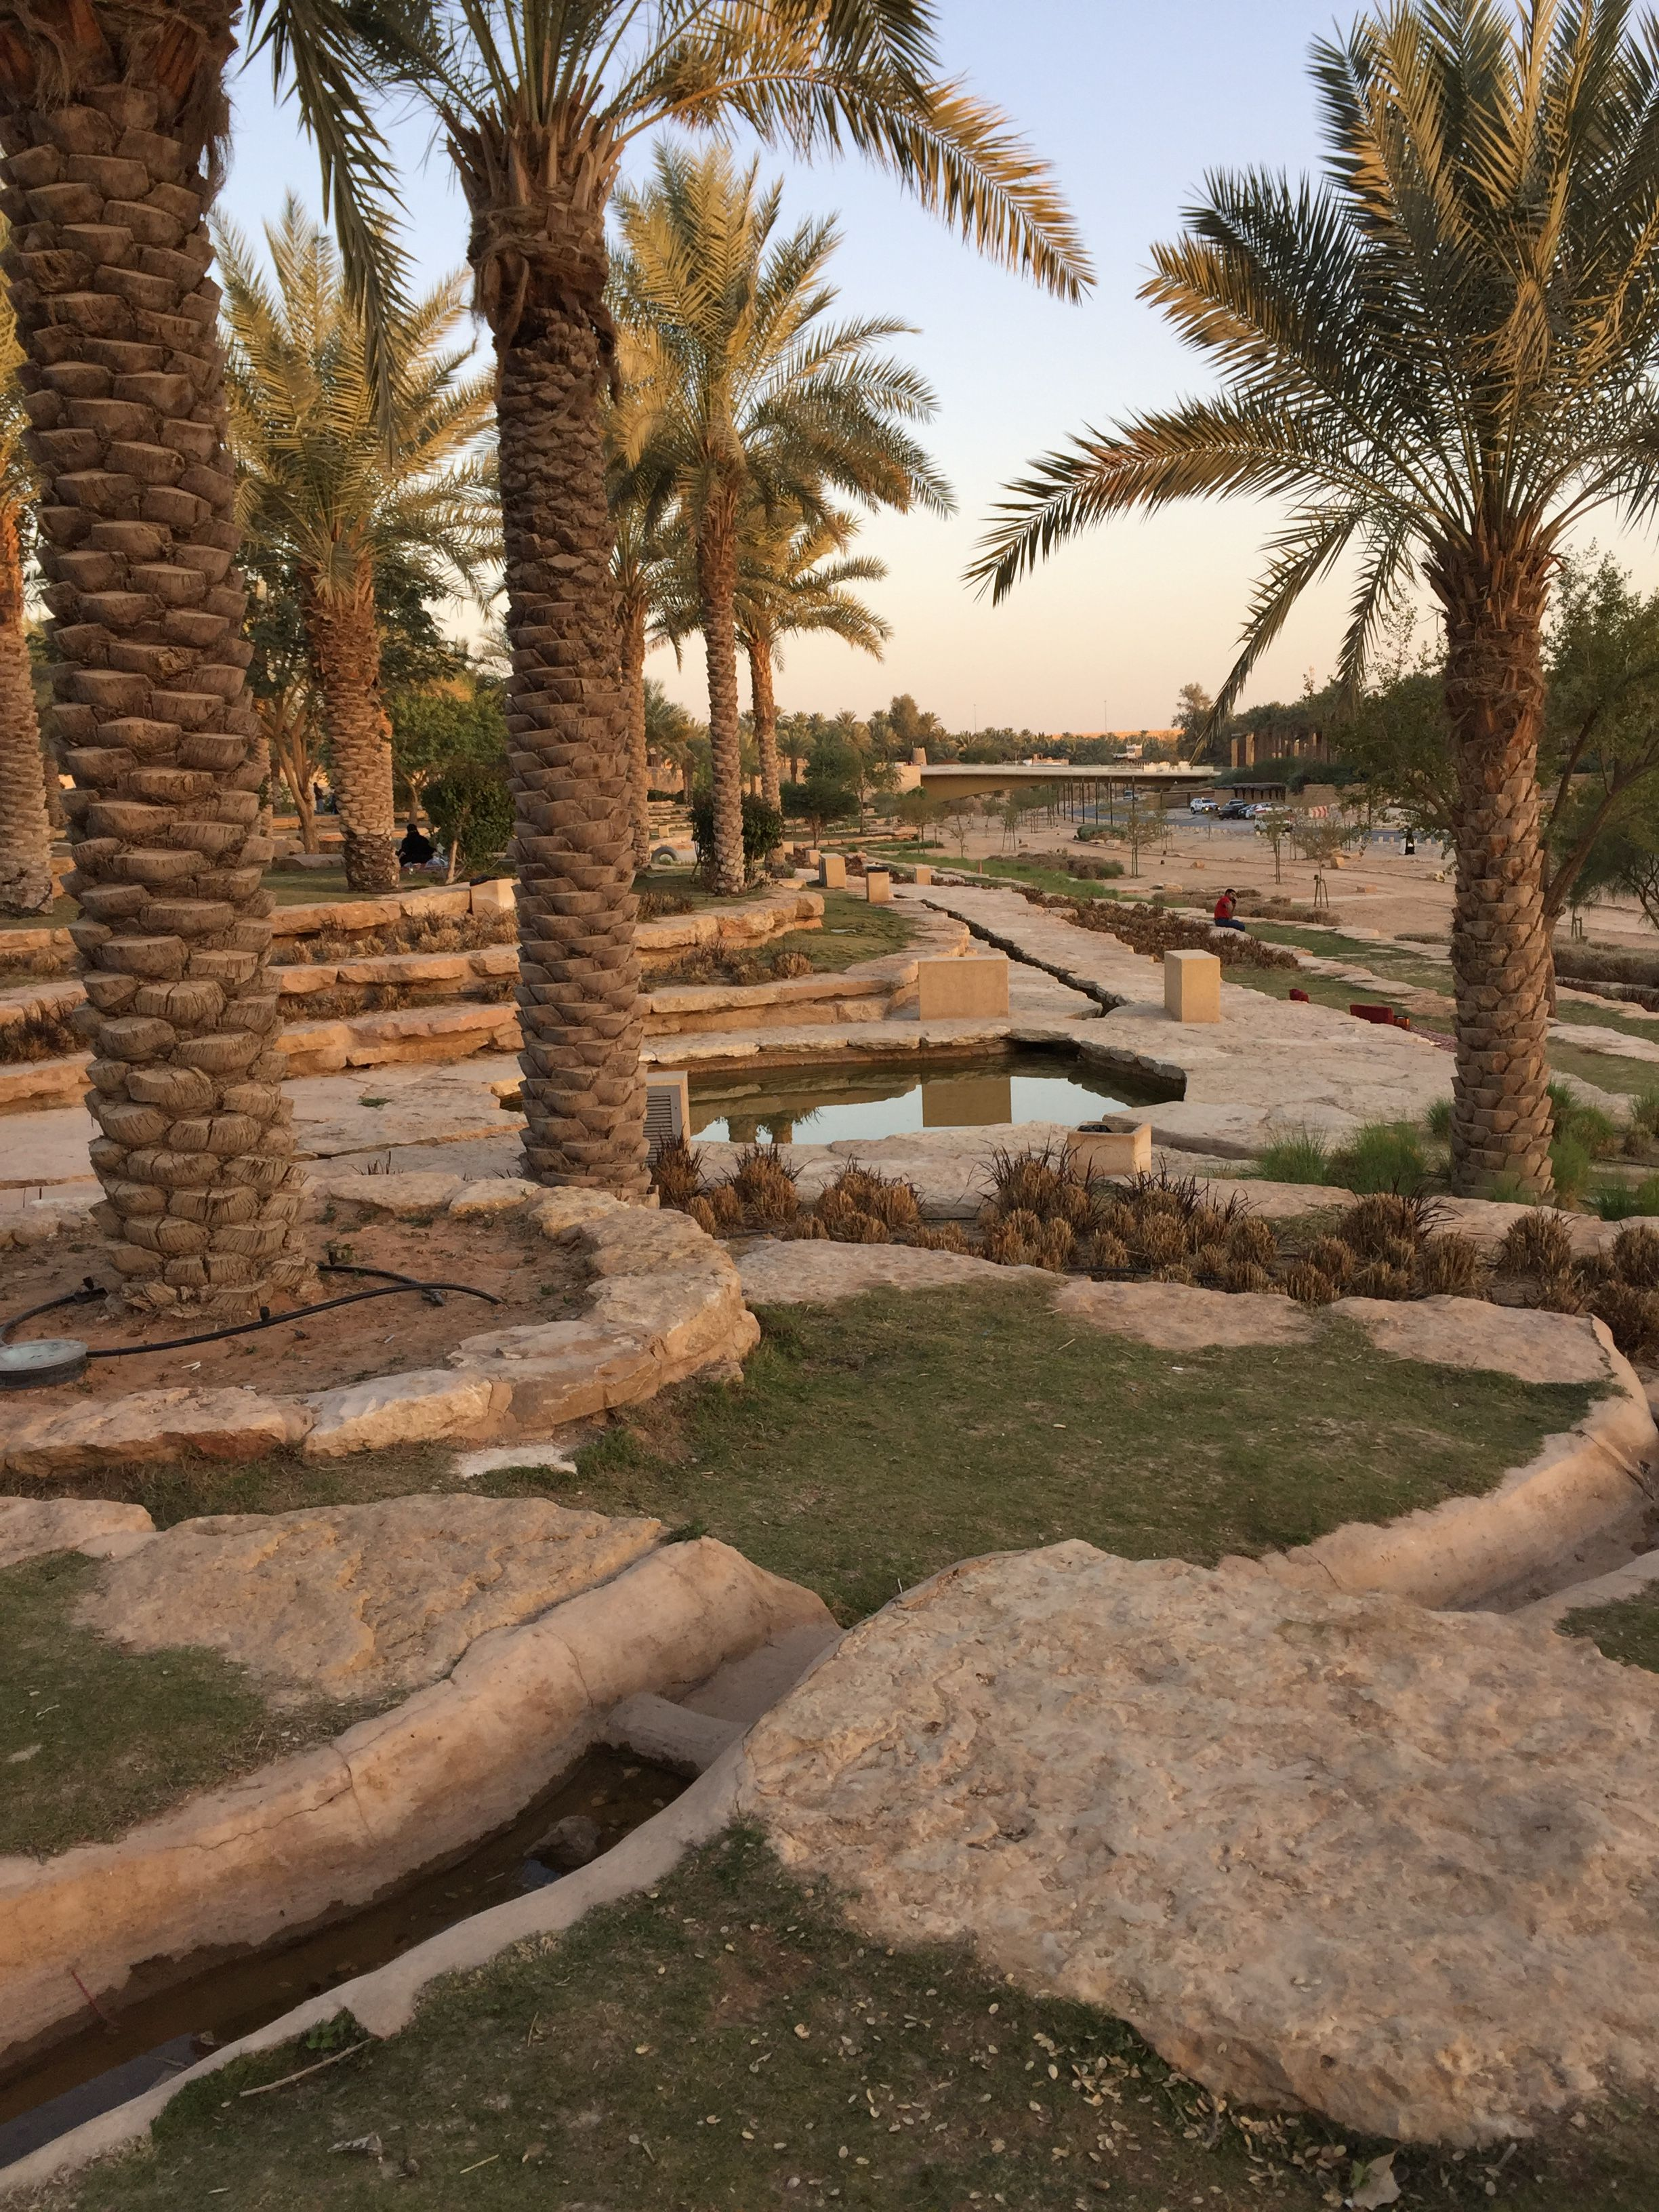 Wadi Hanifah Park Excellent Place To Spend Picnic Landscaping Images Landscape Desert Landscaping